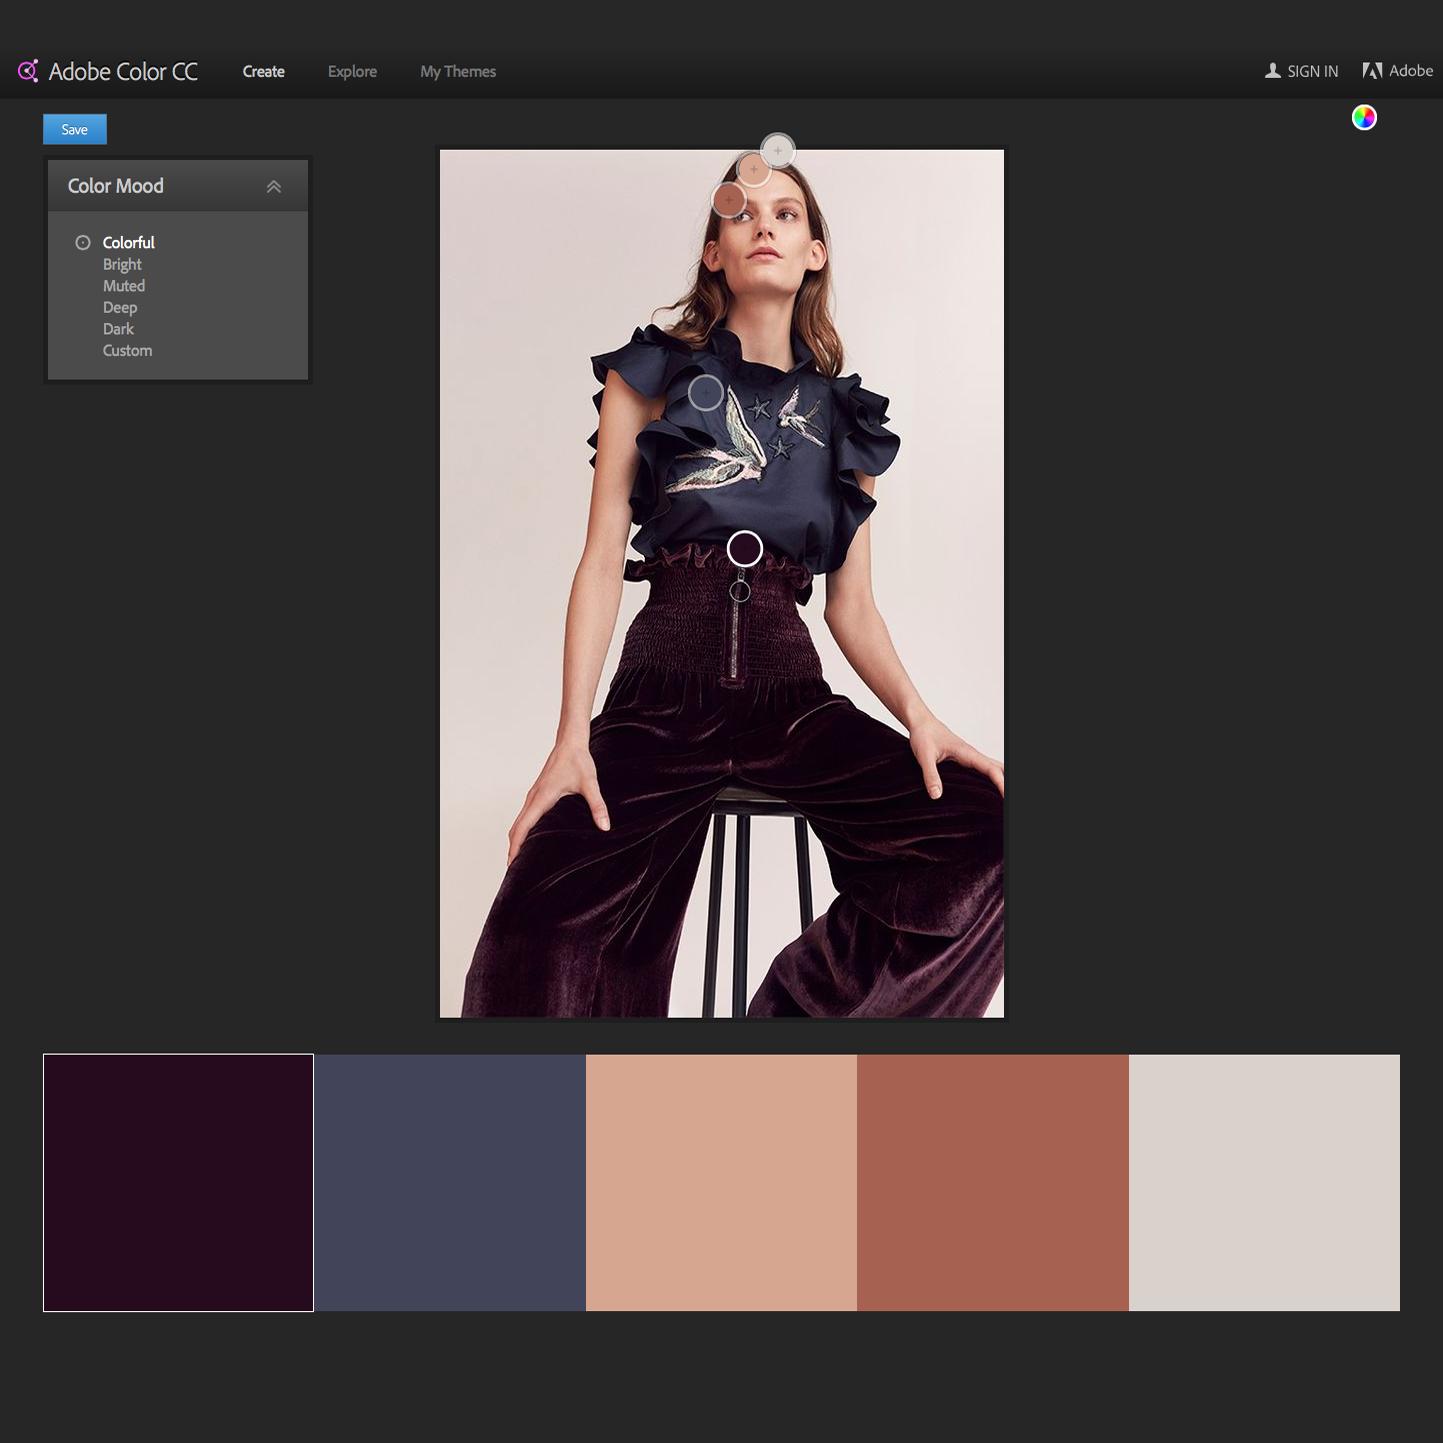 adobe color wheel - how to choose a color palette | Go live hq